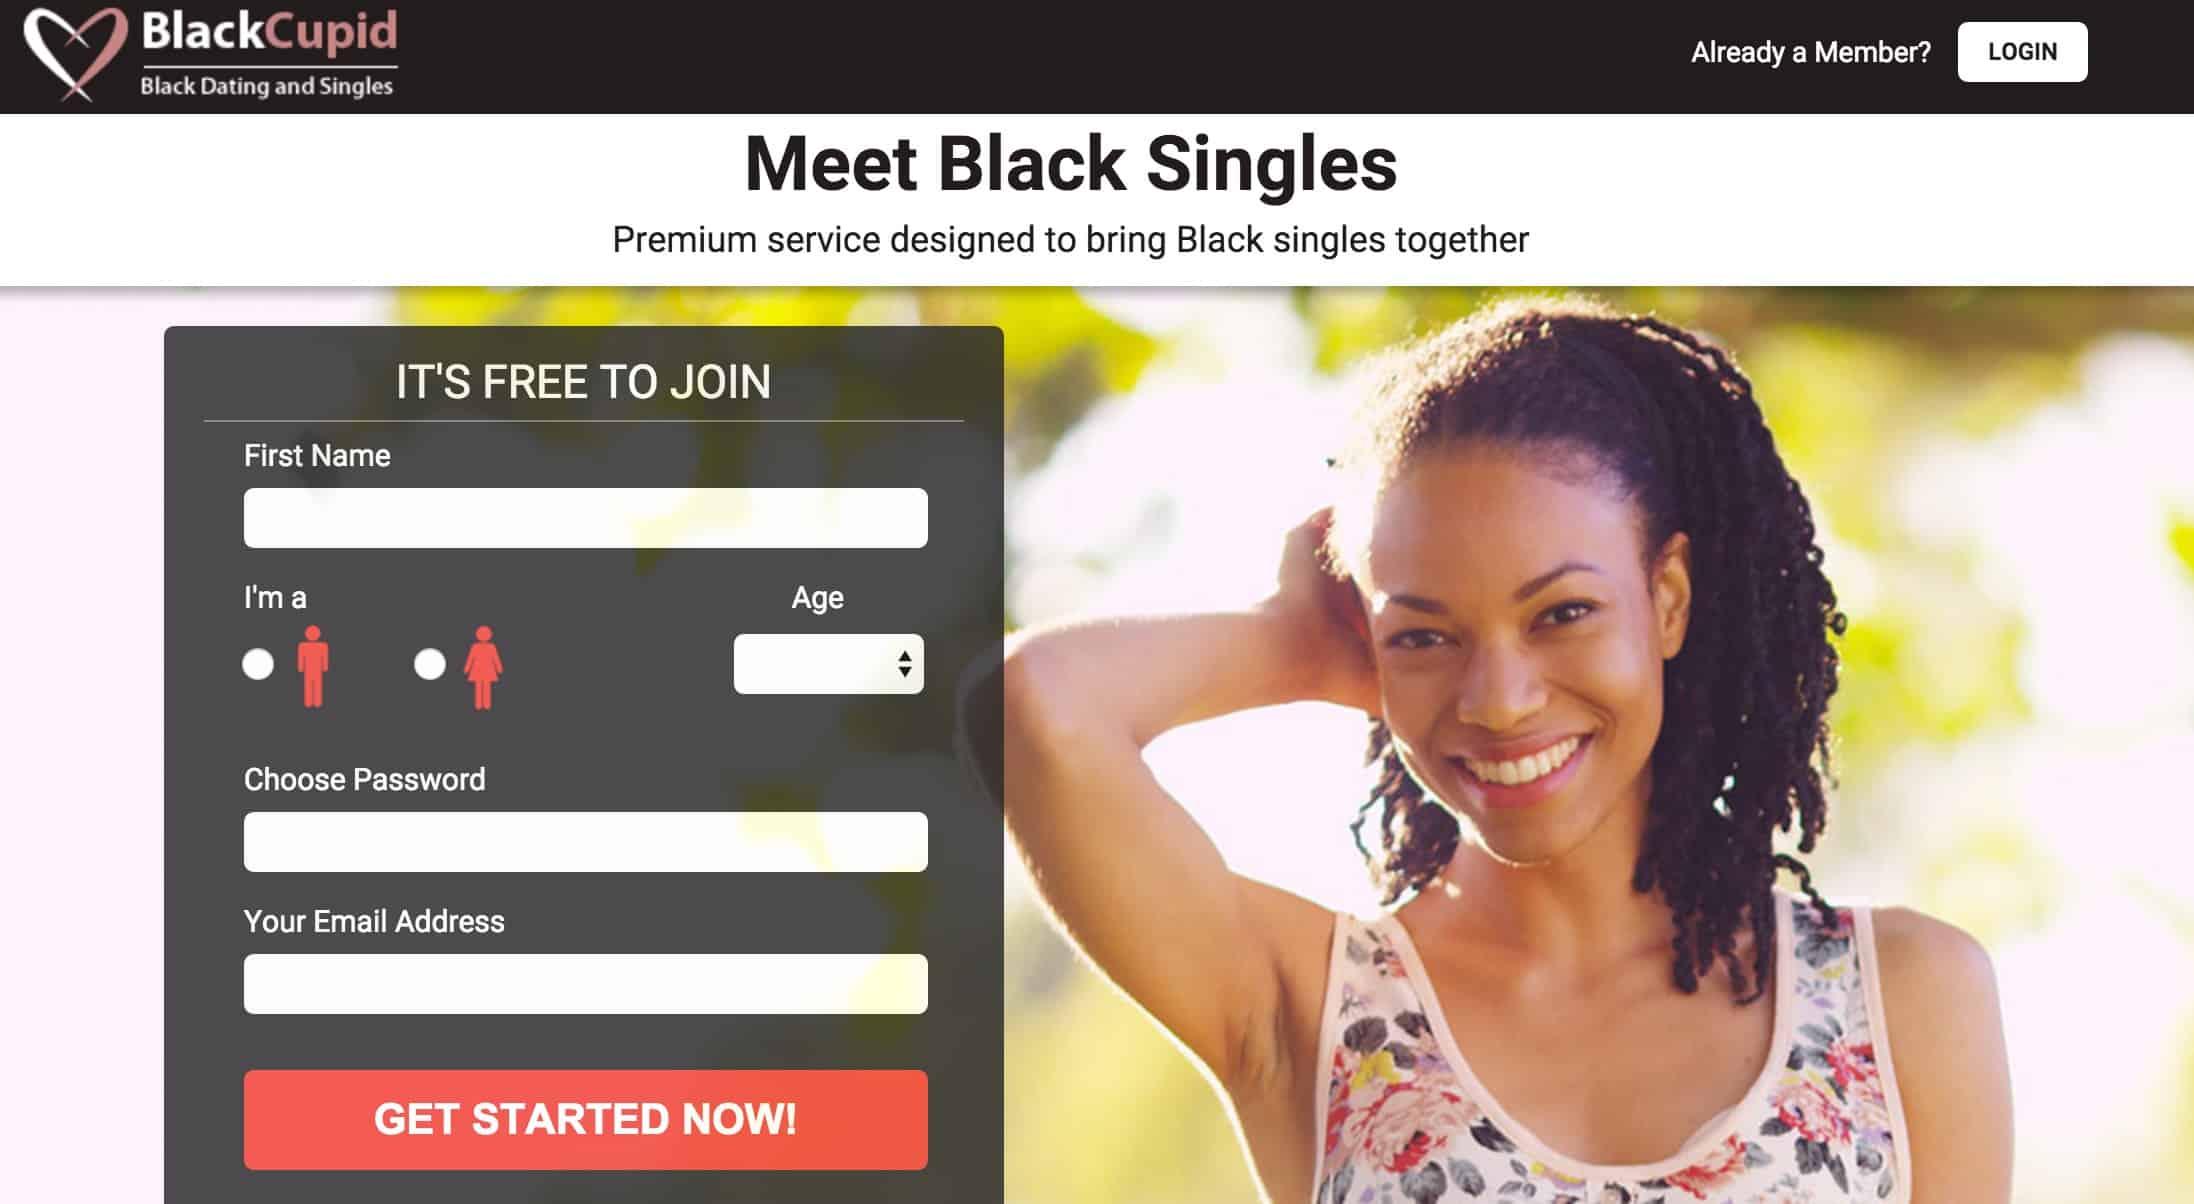 Top 5 Black Dating Sites Reviews (2019) - DatingWebsites101